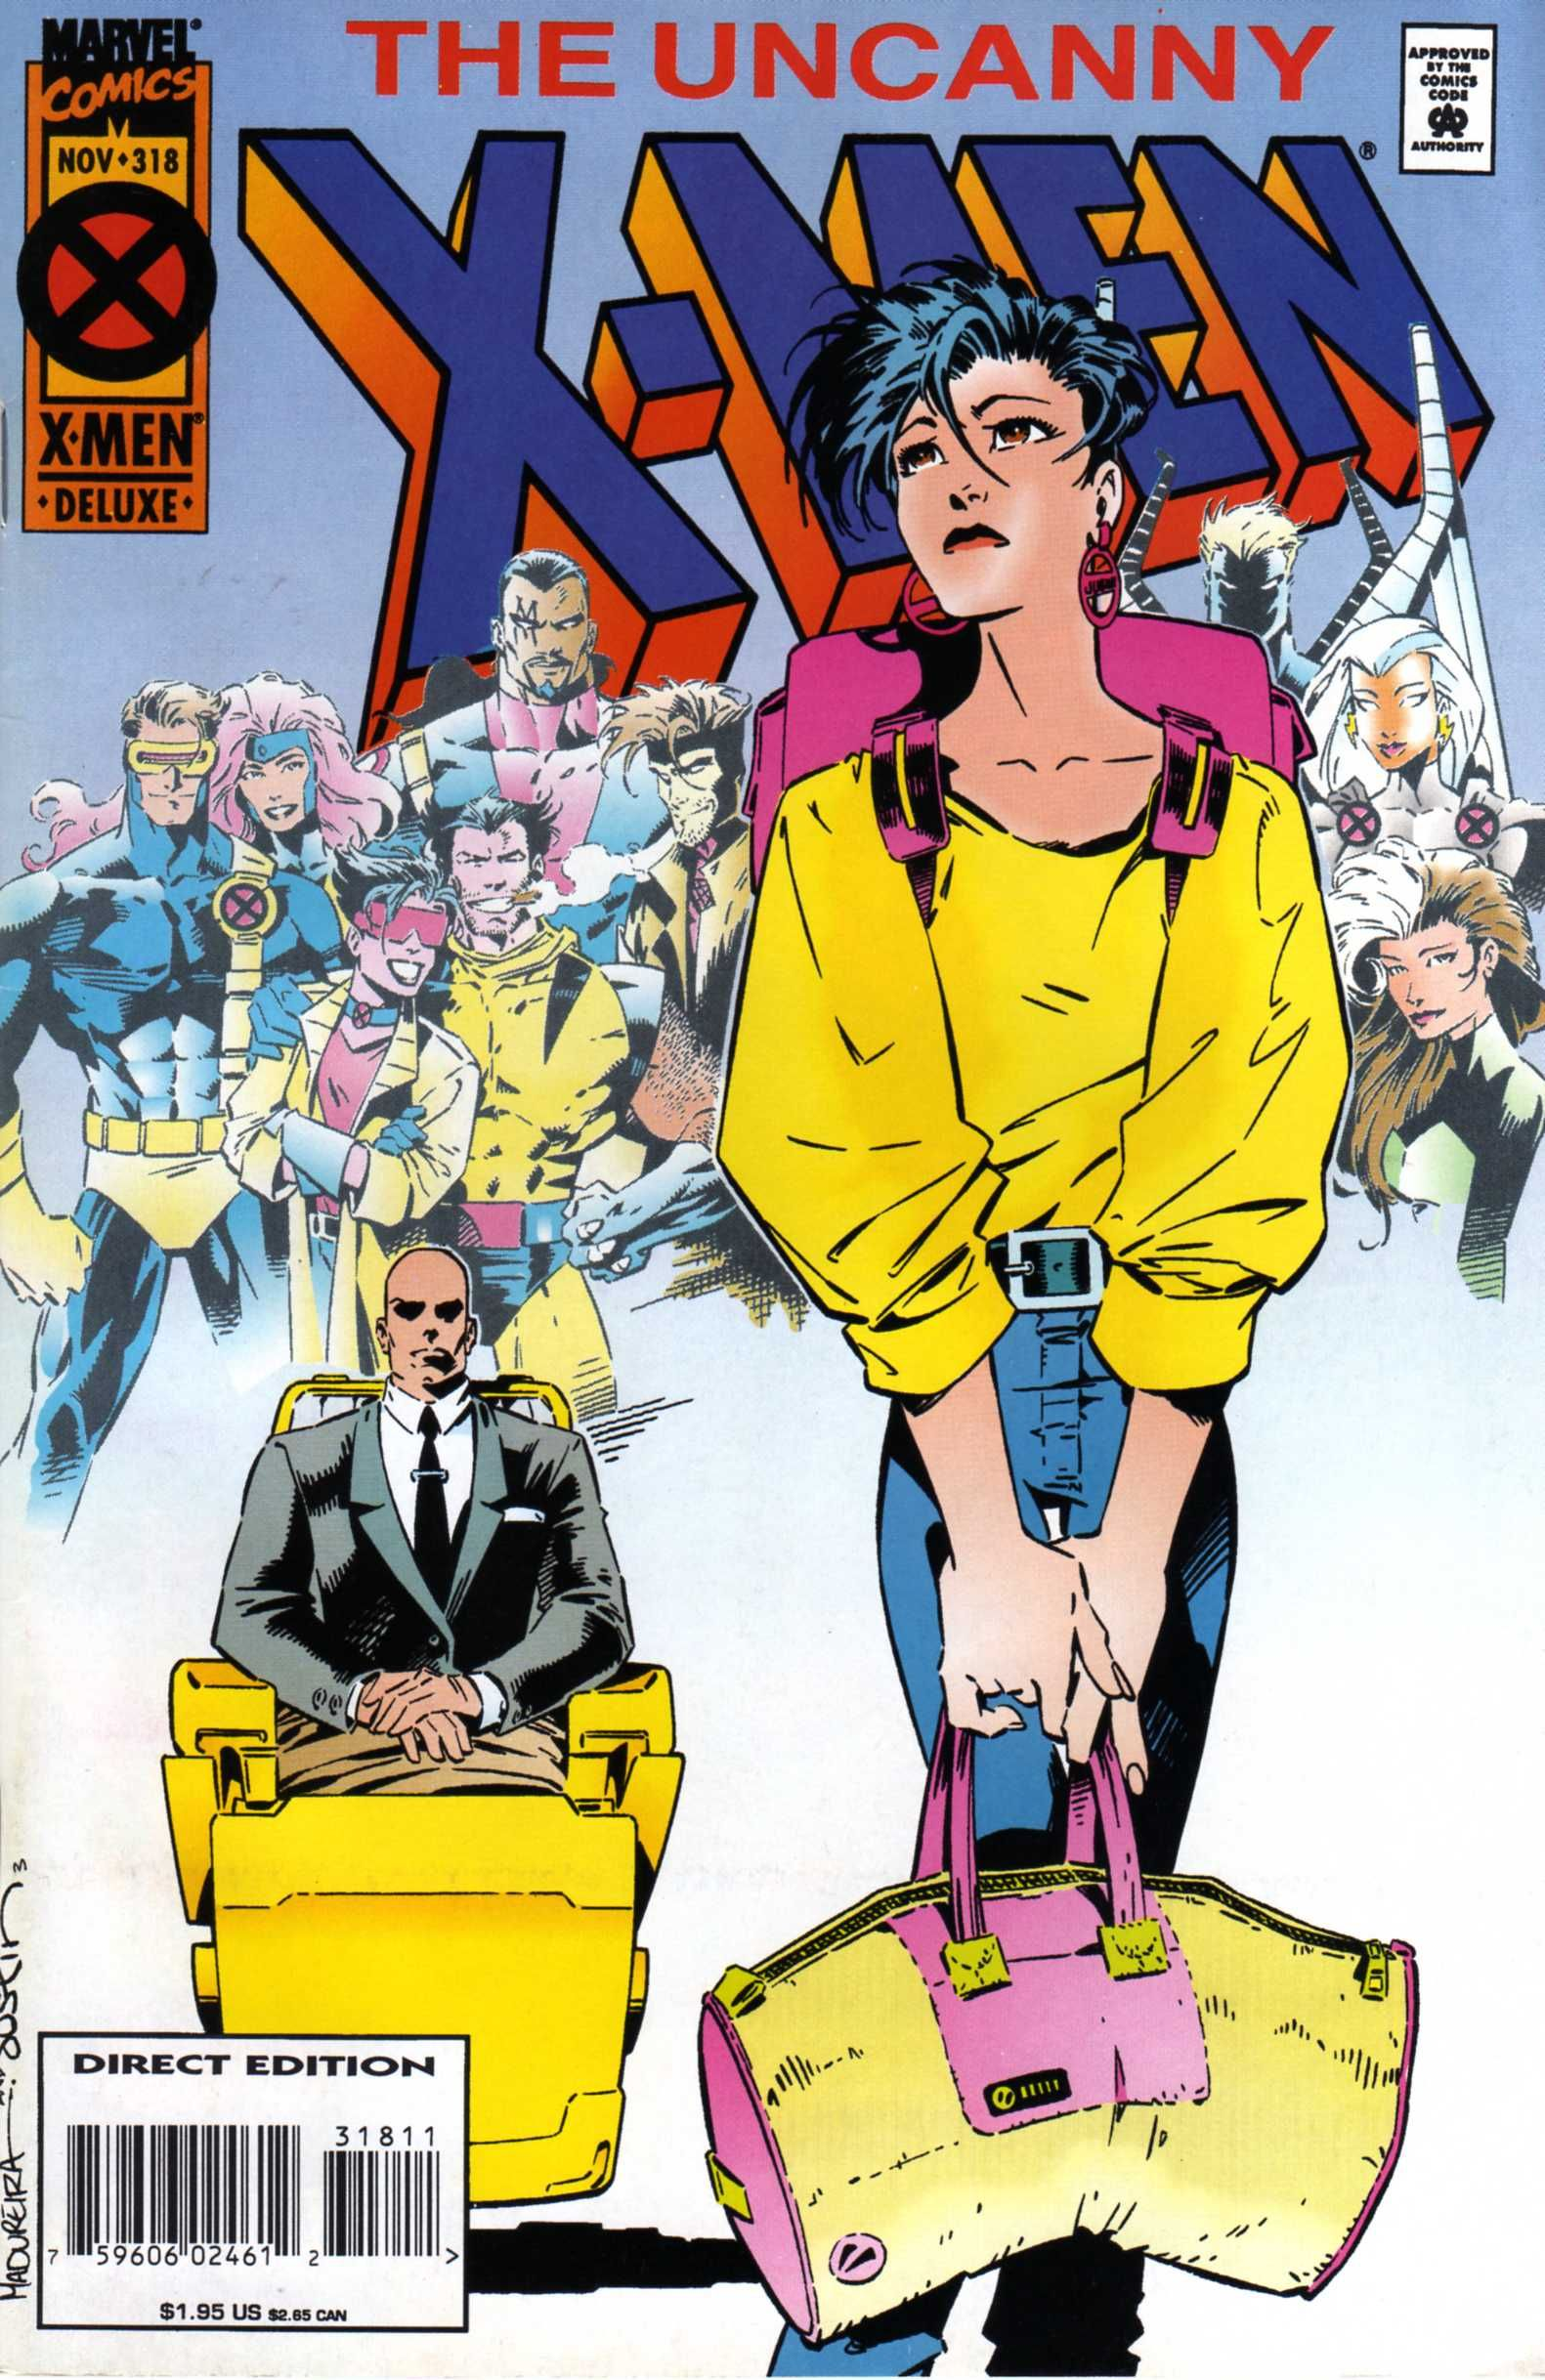 Jubilee In The Uncanny X Men Vol 1 318 Cover Art By Joe Madureira Terry Austin Comics X Men Marvel Comics